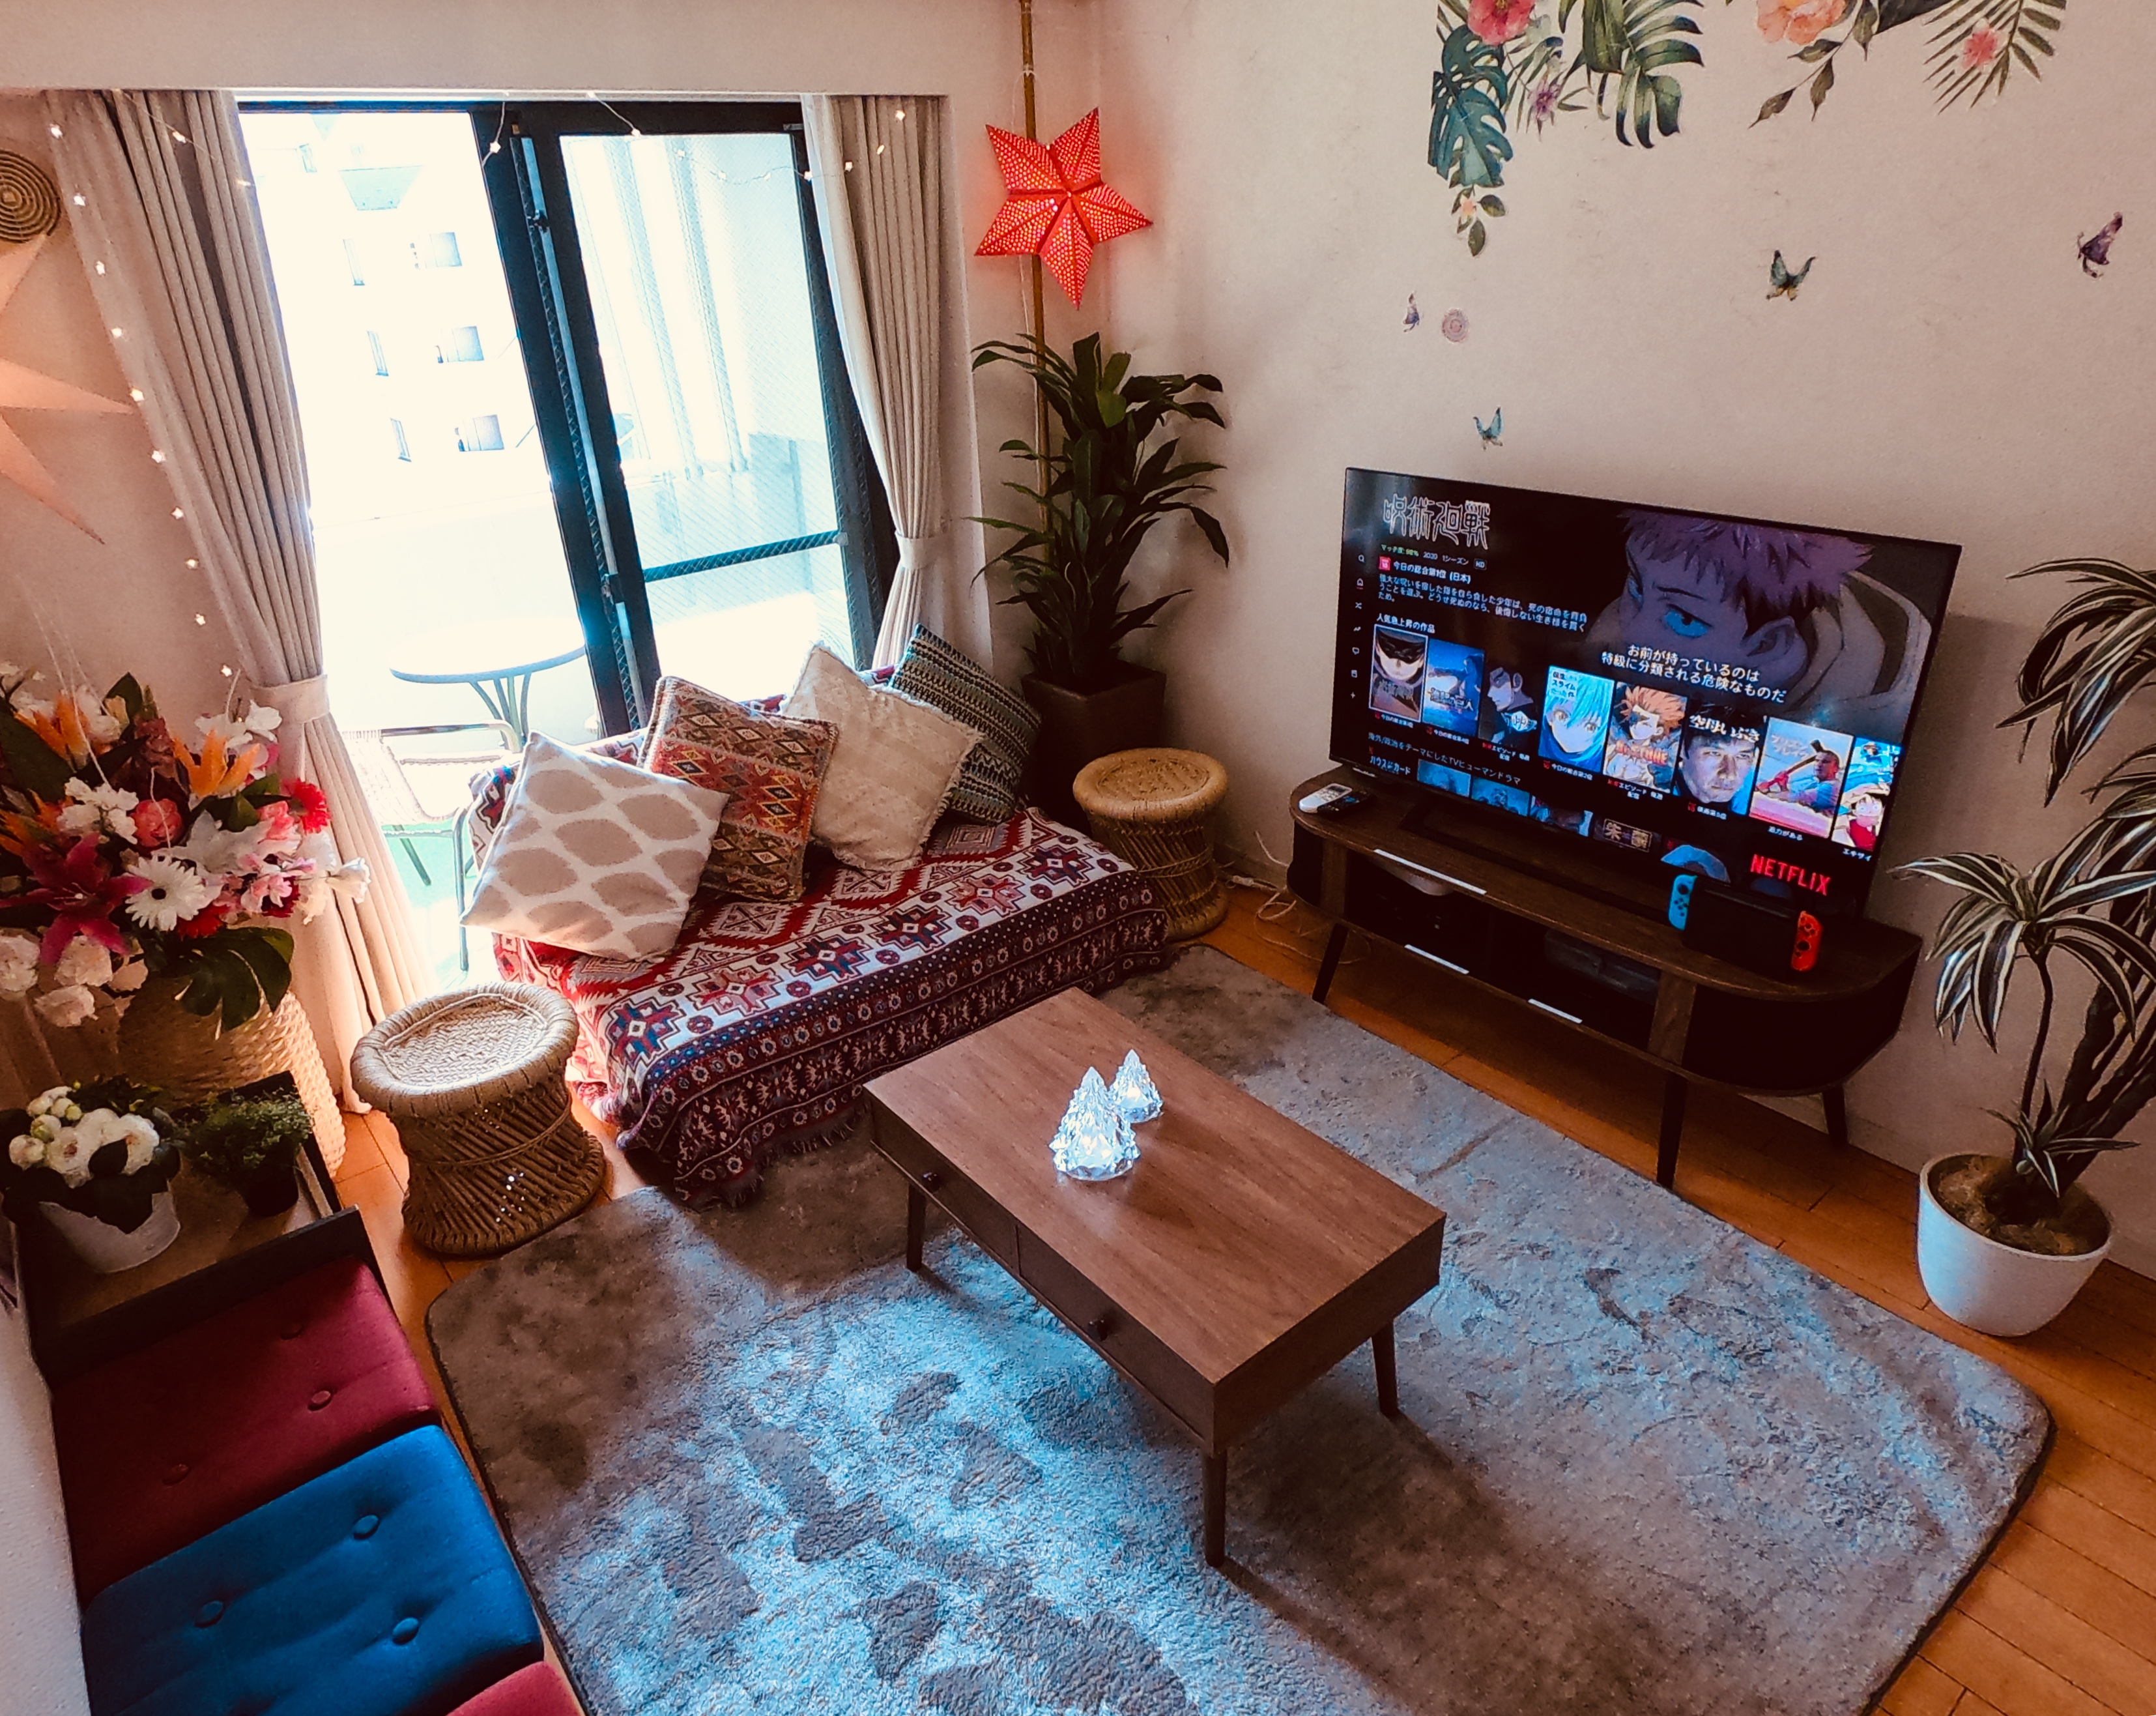 SP013 KABUKI1102 SP013 パーティースペースの室内の写真